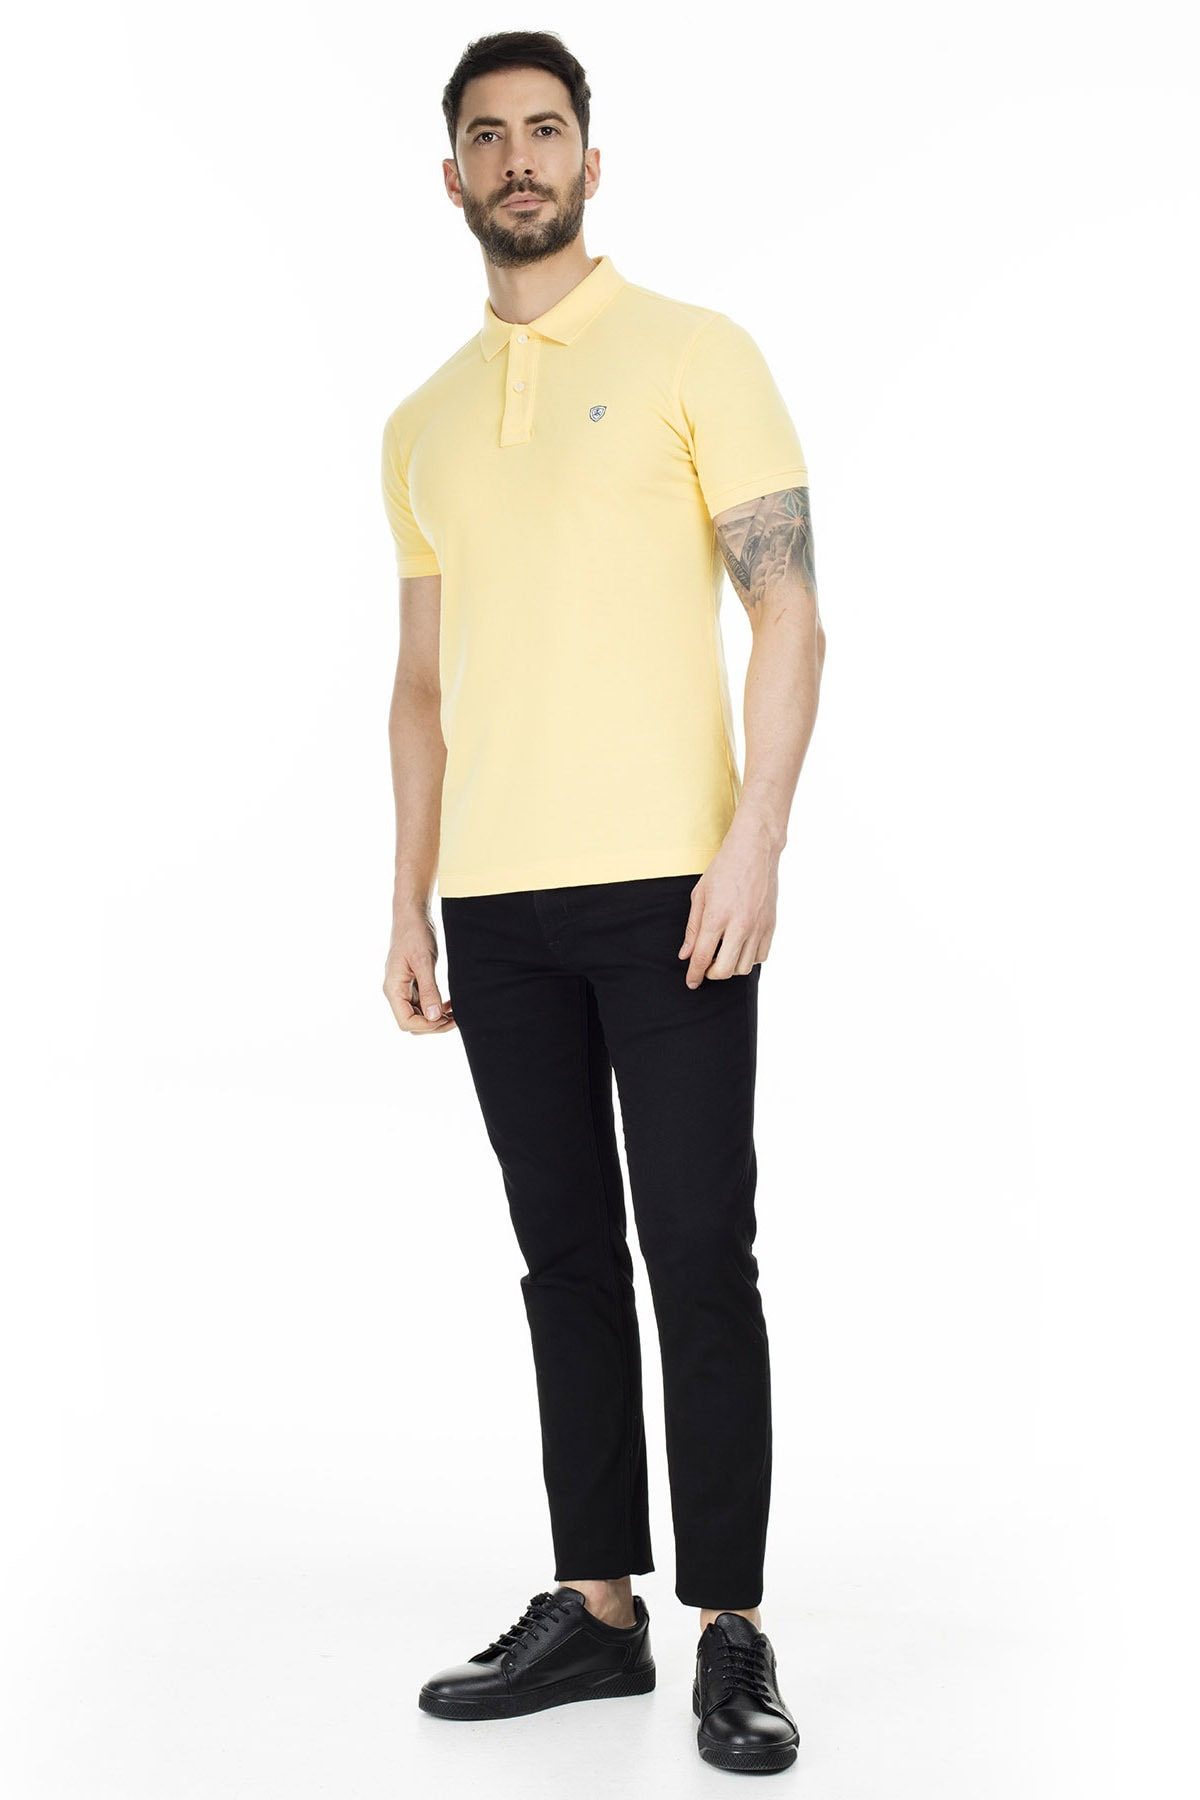 Lufian Laon Spor Polo T- Shirt Sarı 3